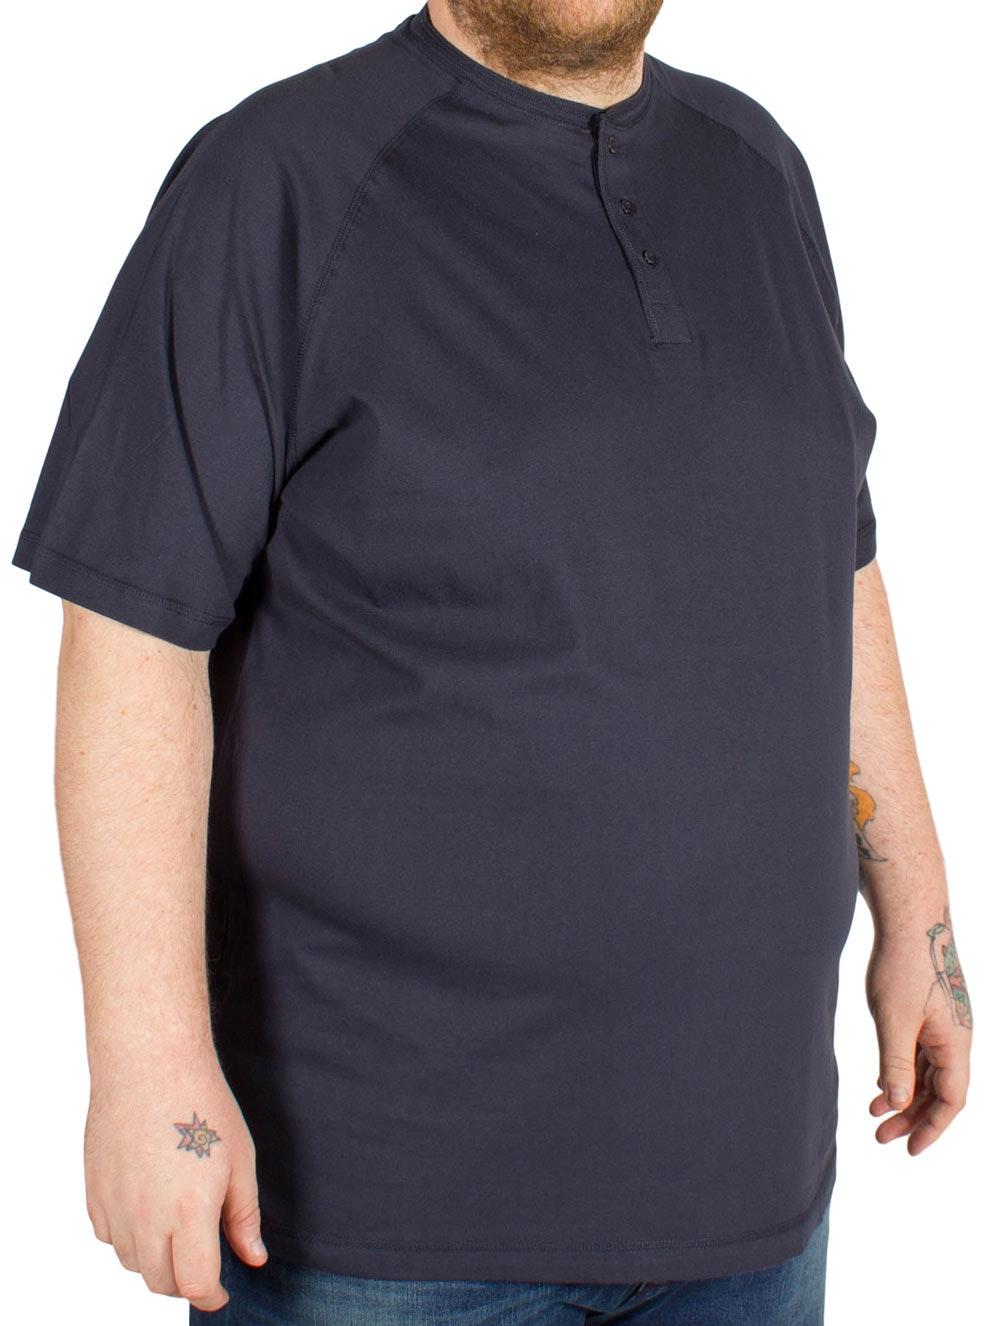 Cotton Valley Grandad T-Shirt Navy